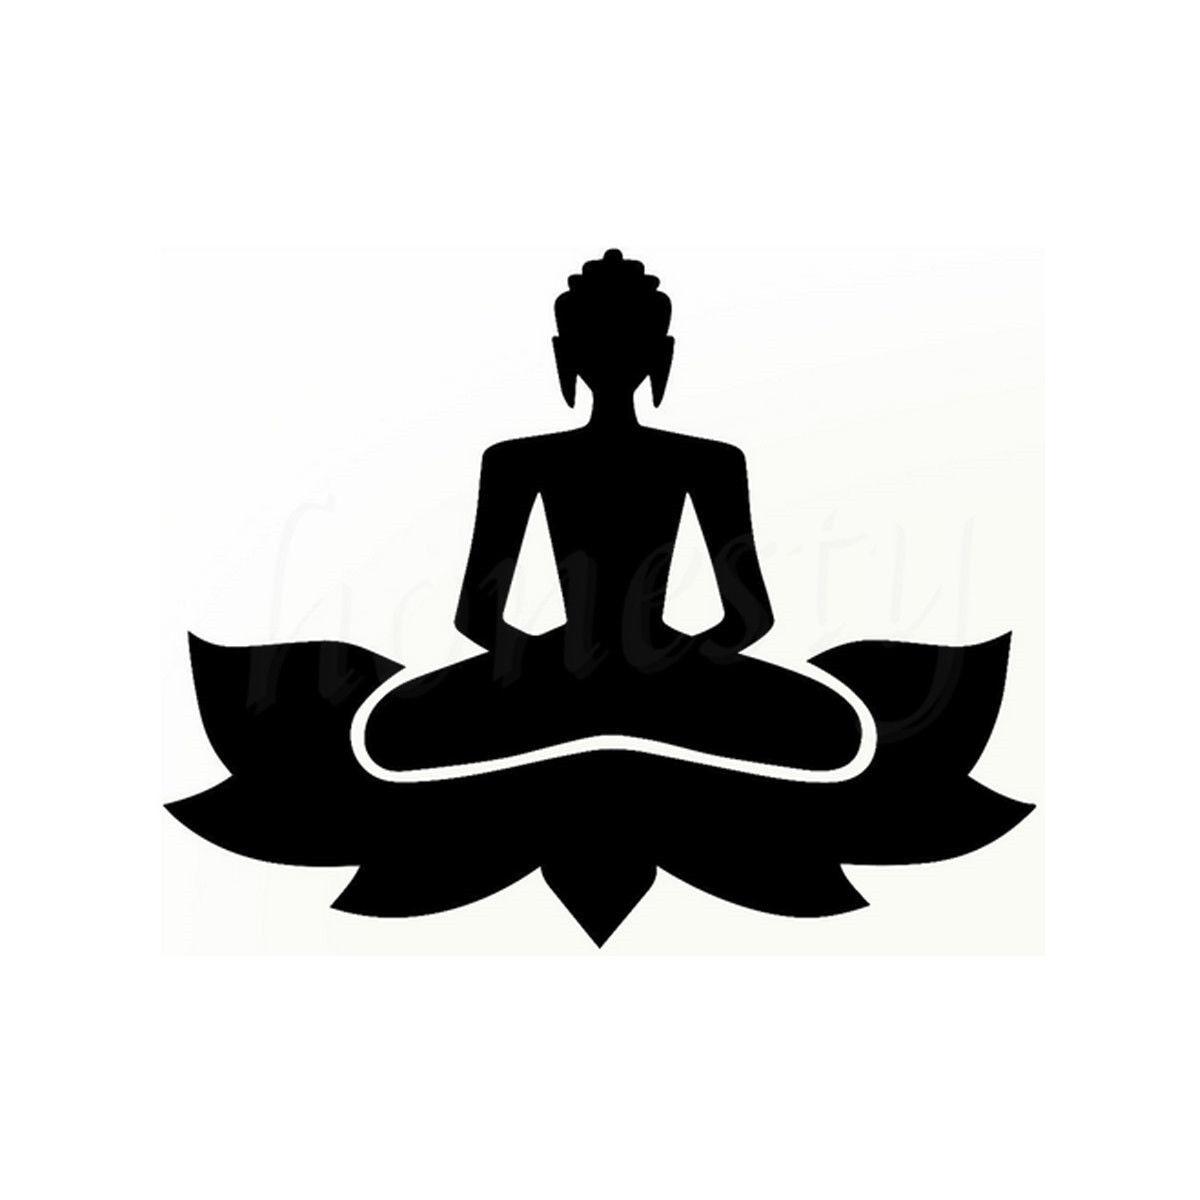 Buddha Zen Yoga Lustige Auto Lkw Fenster Bumper Wand Hause